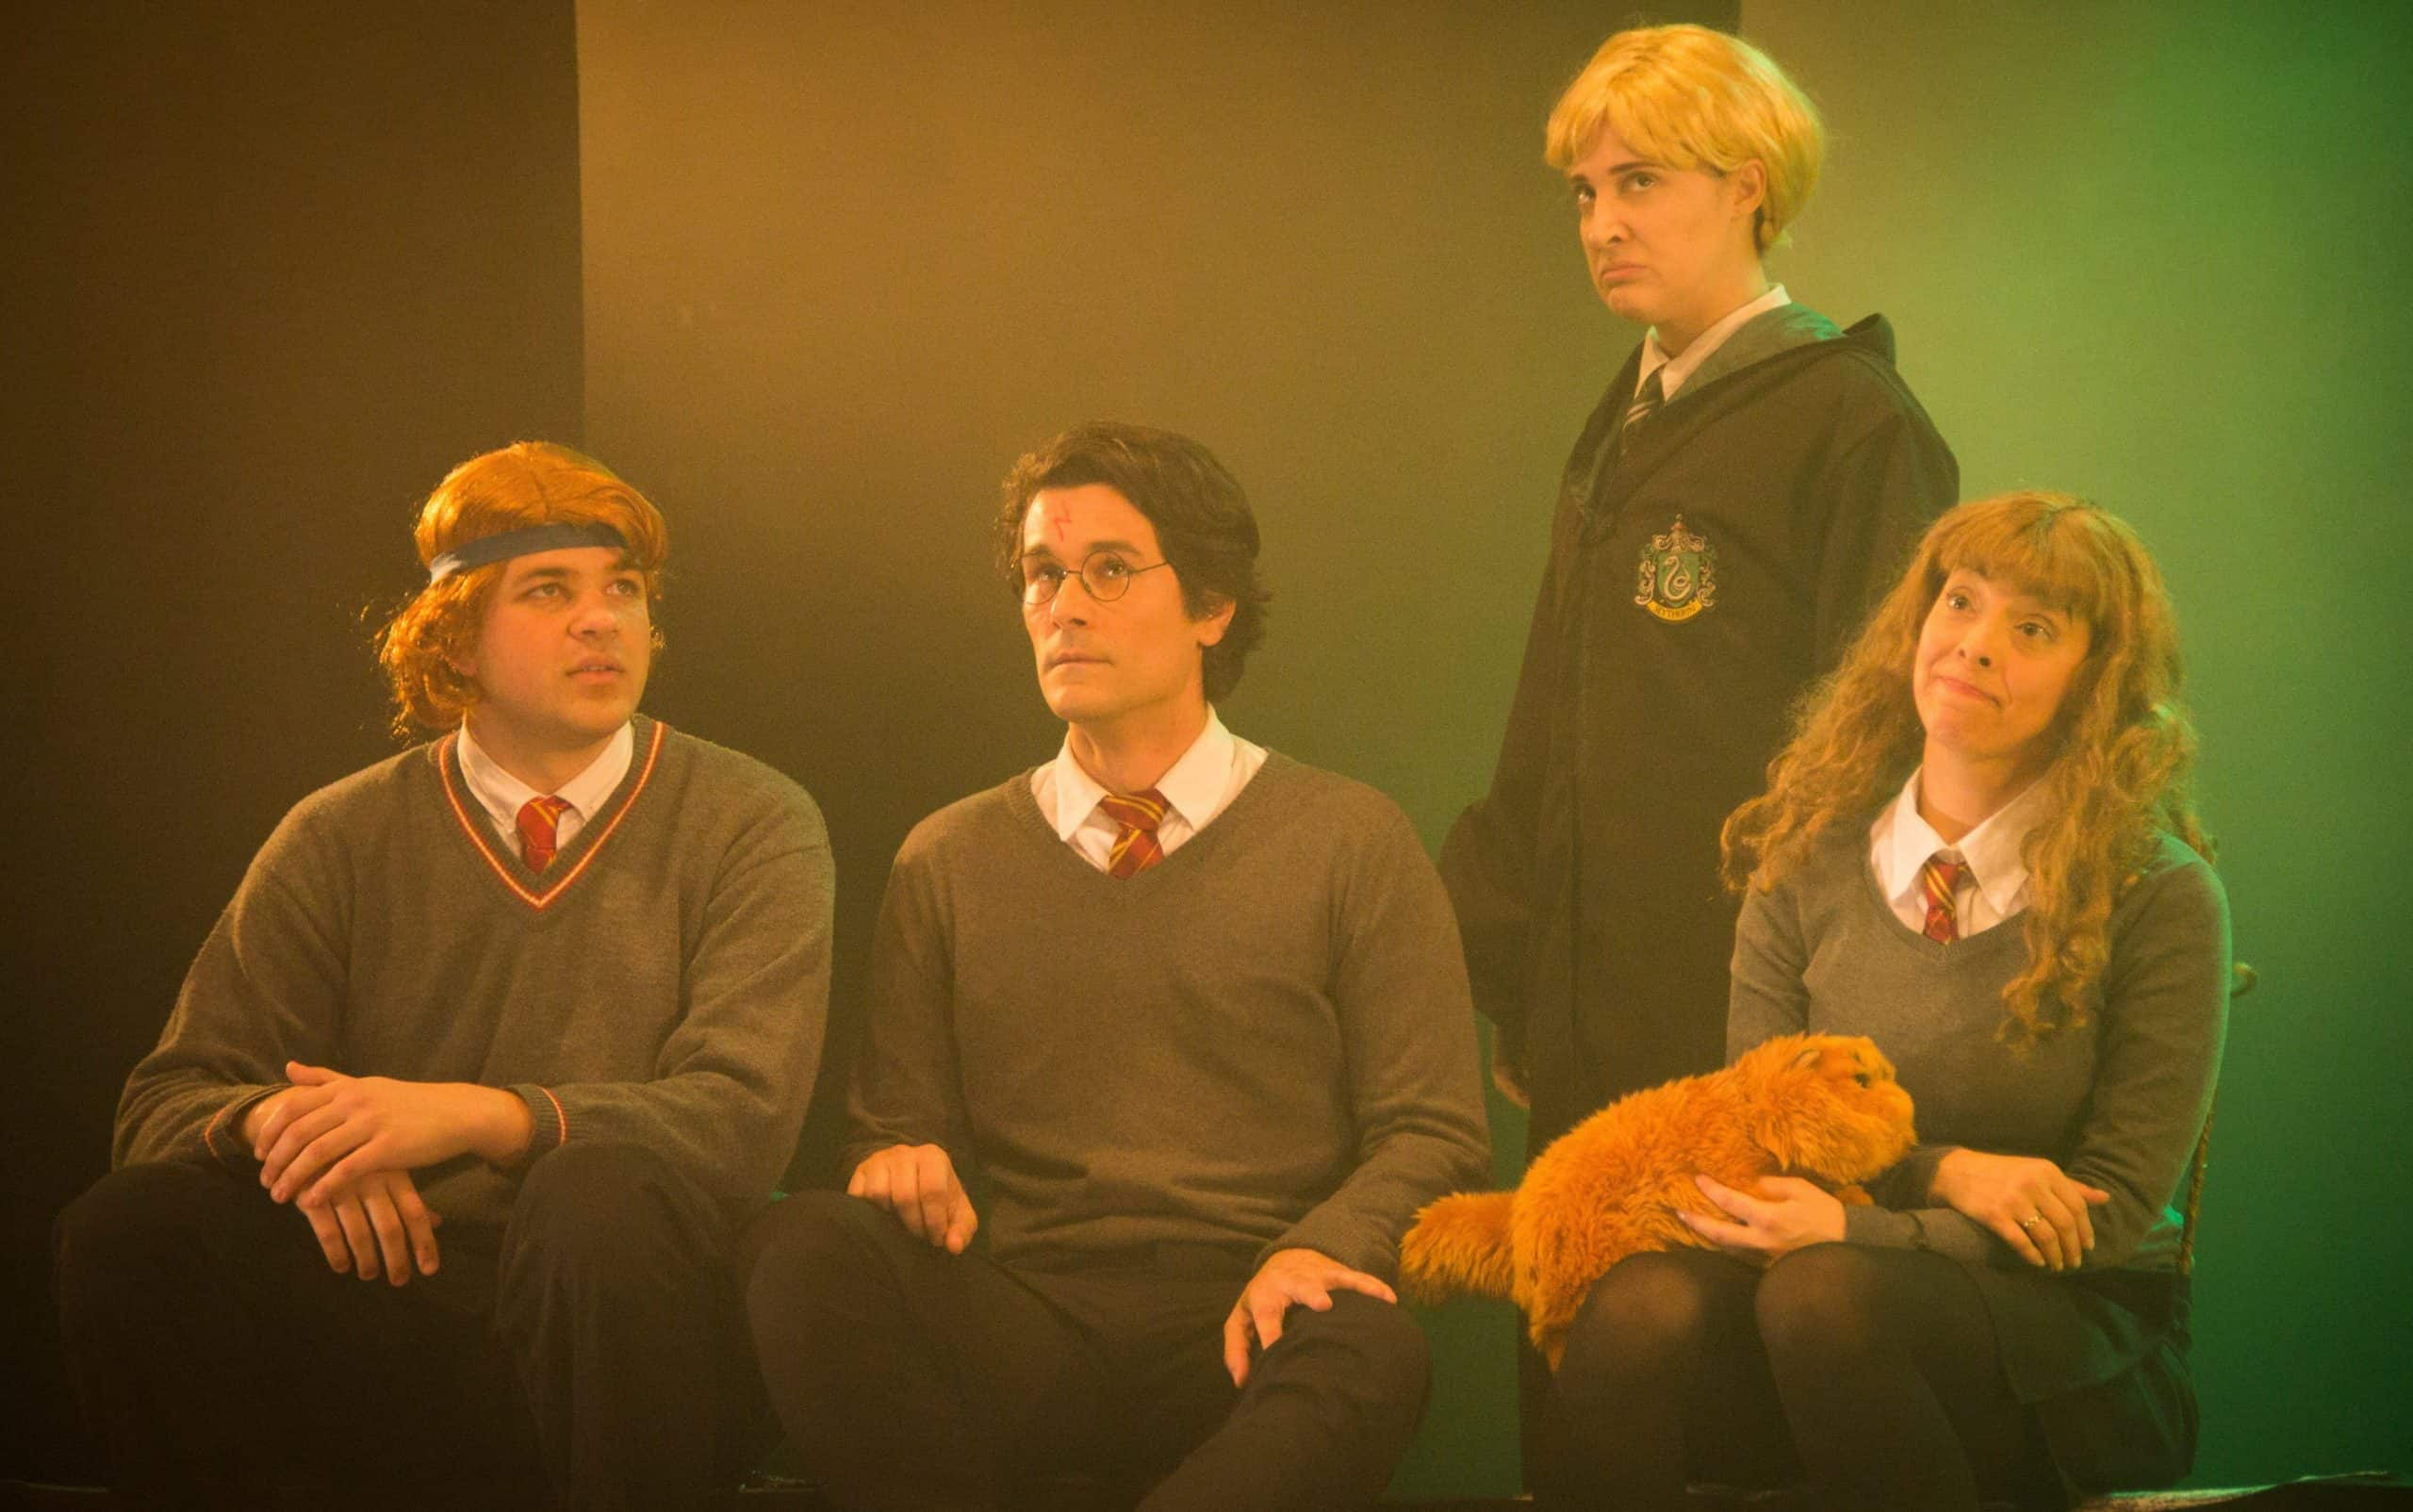 Rony, Harry, Hermione e Malfoy na versão brasileira de A Very Potter Musical